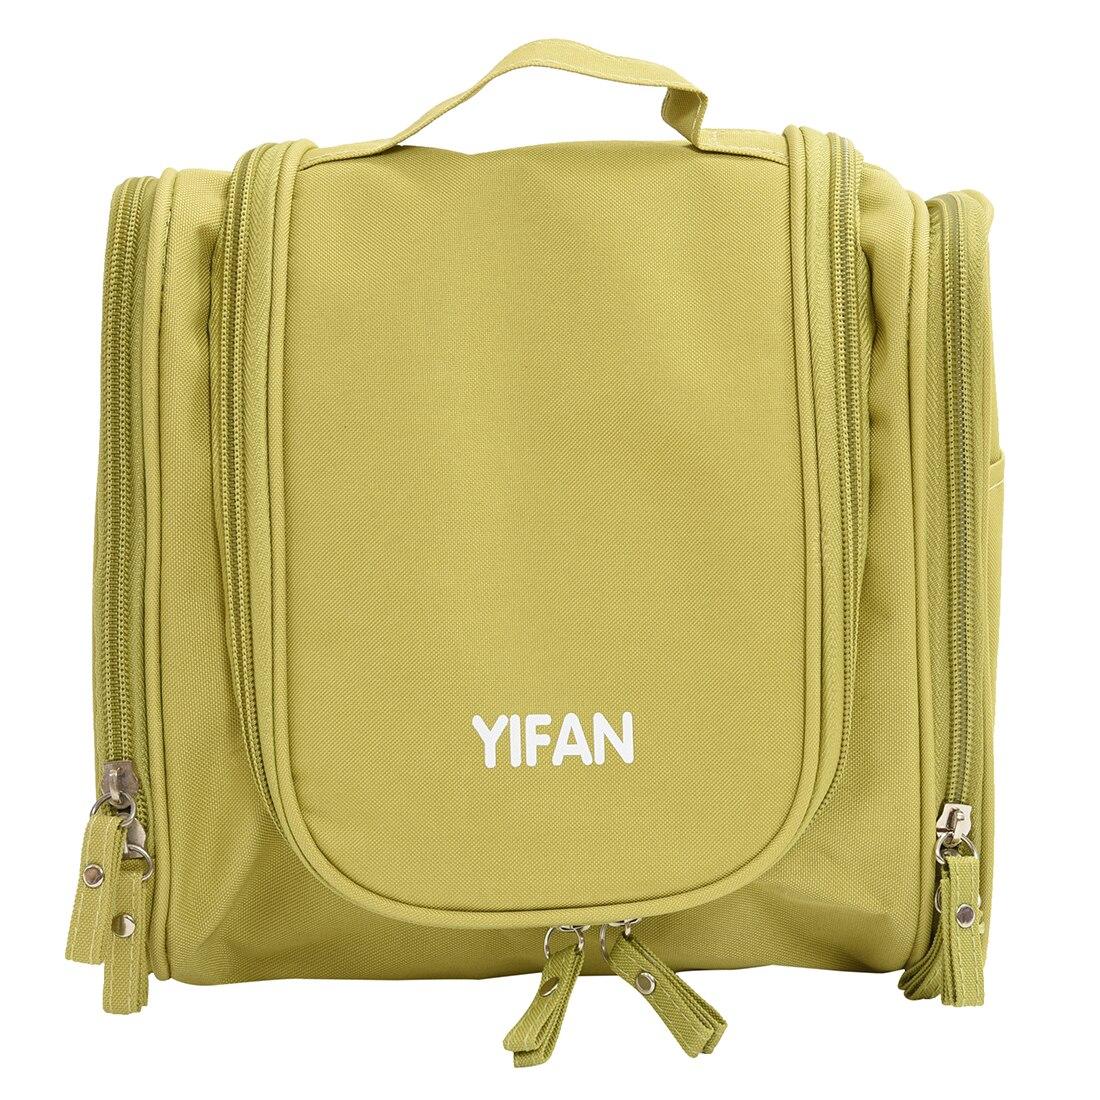 5 X SNNY Waterproof Travel Cosmetic Bag Organizer Toiletry Makeup Bag Organizador Wash Make Up Bag Bolsa Neceser Maquillaje Case<br>